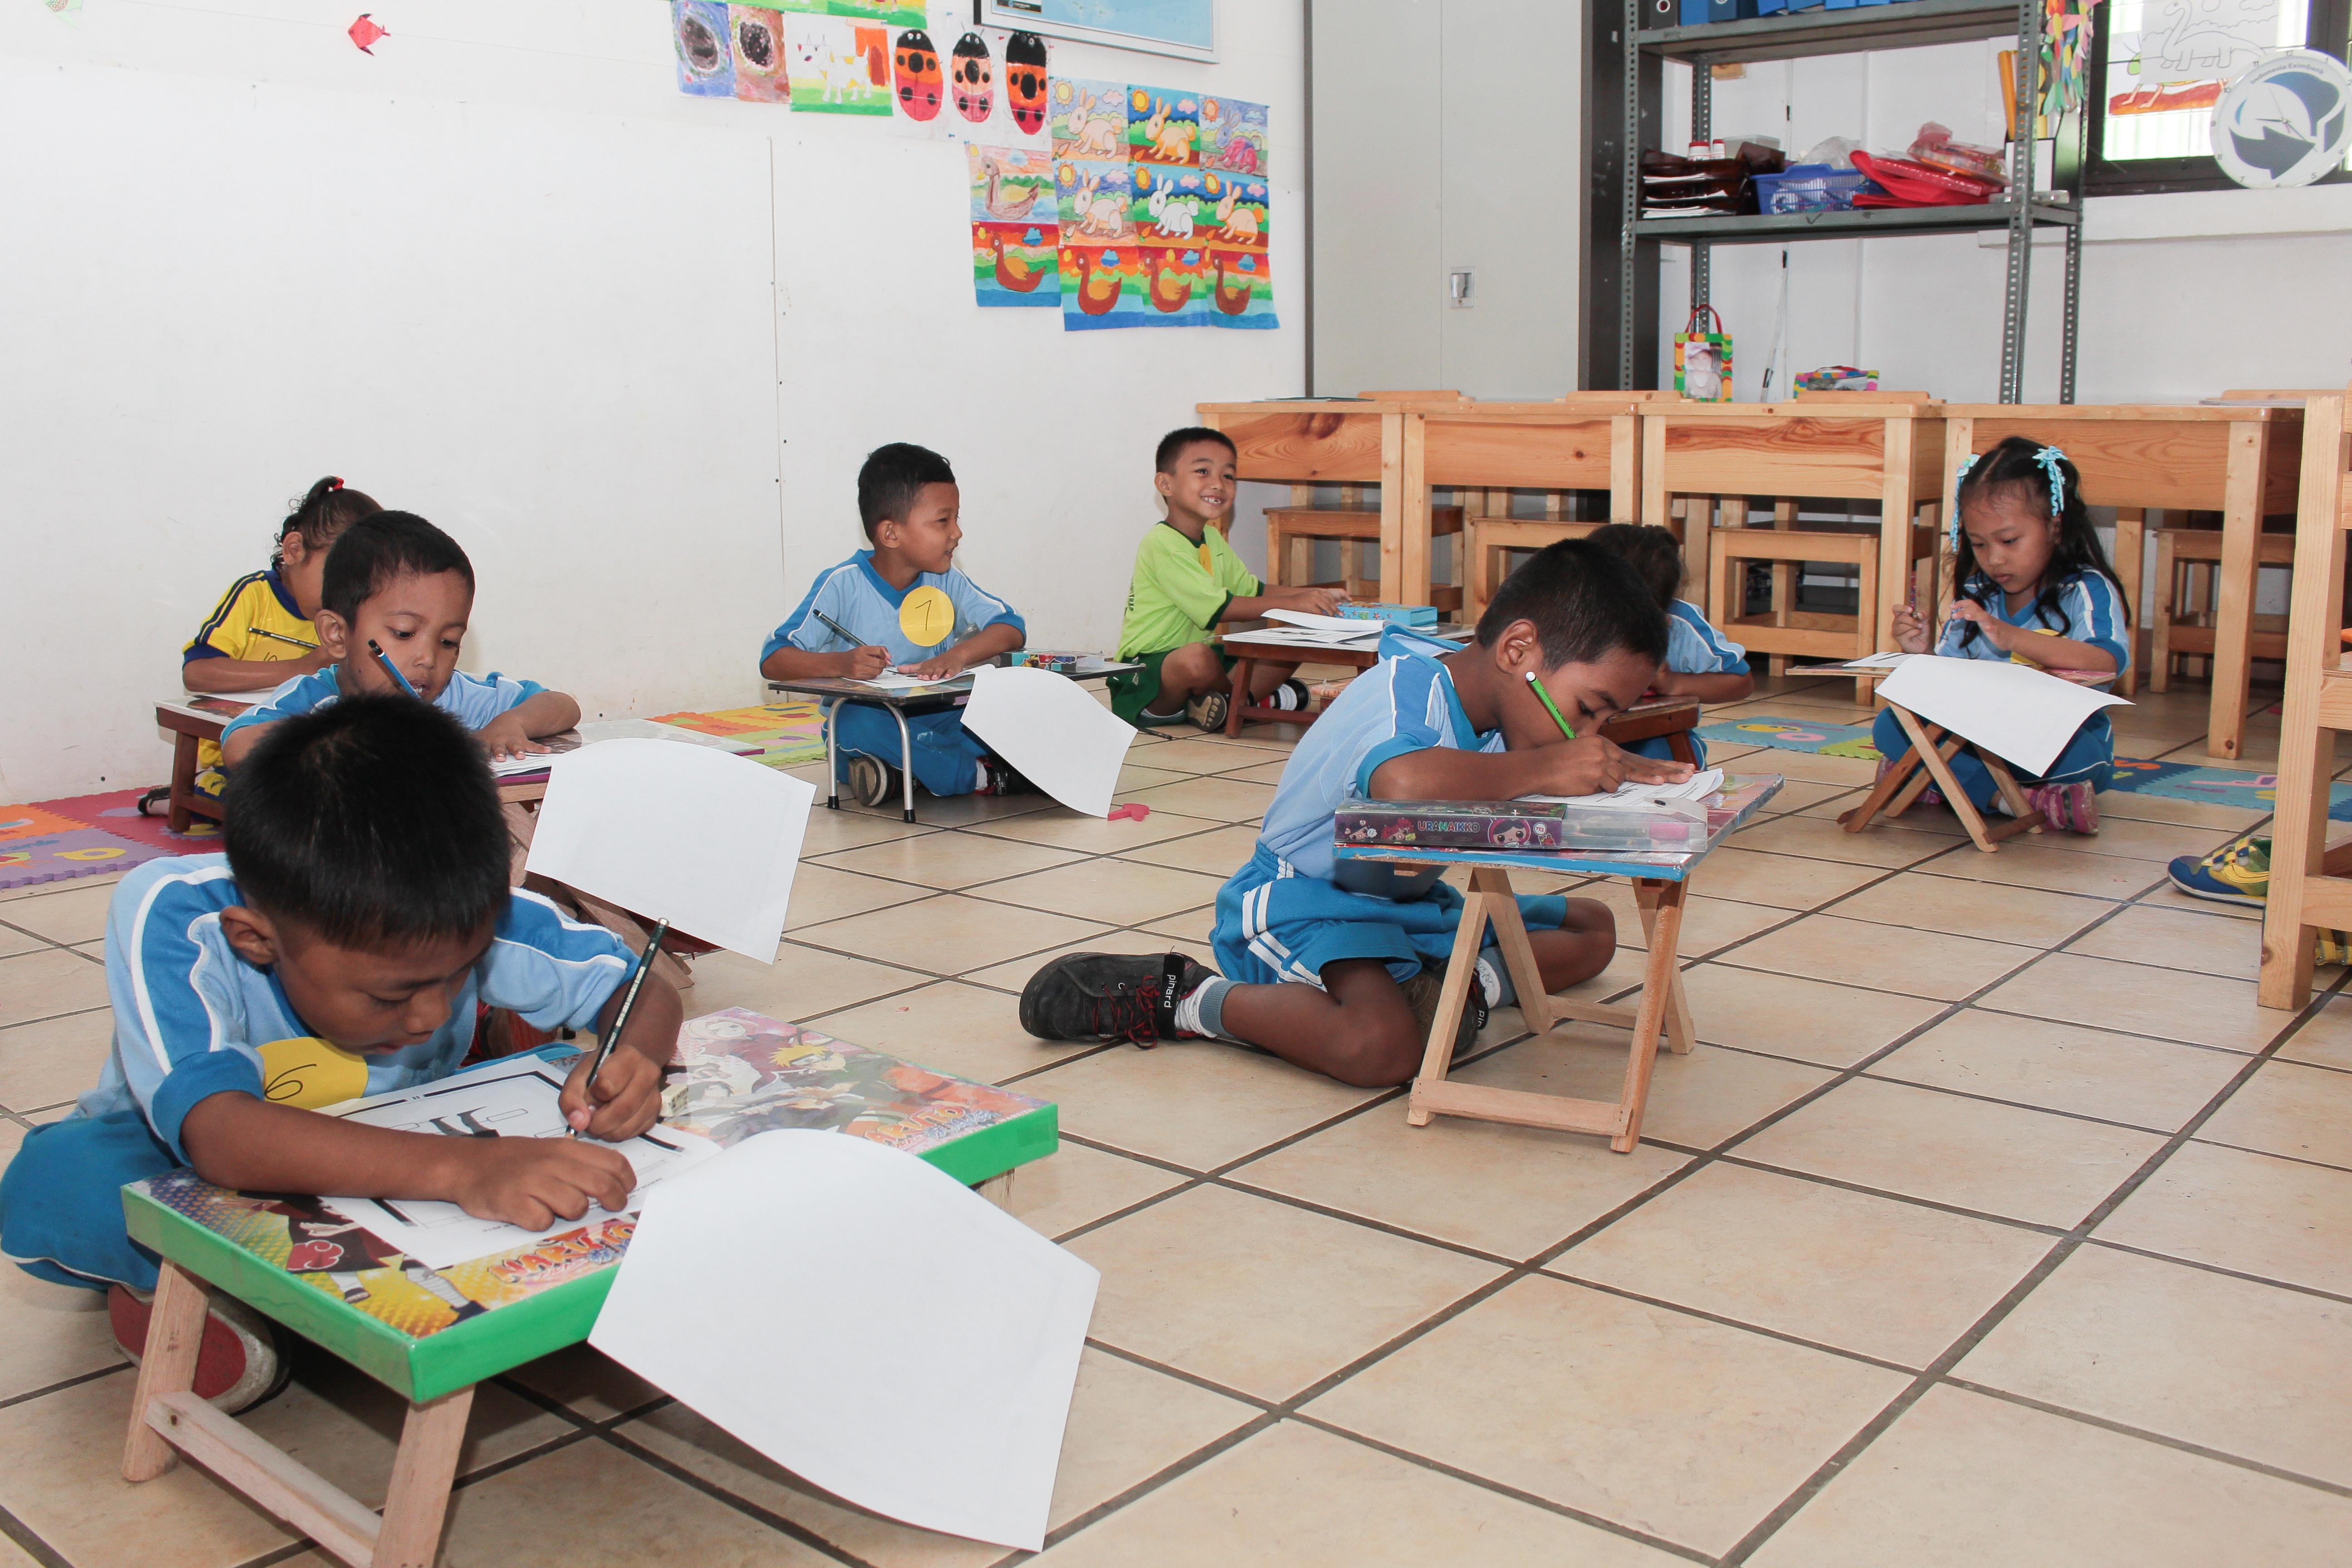 sekolah anak indoensia-sekolah Papua-lomba mewarnai-lomba menggambar-lomba di SAI